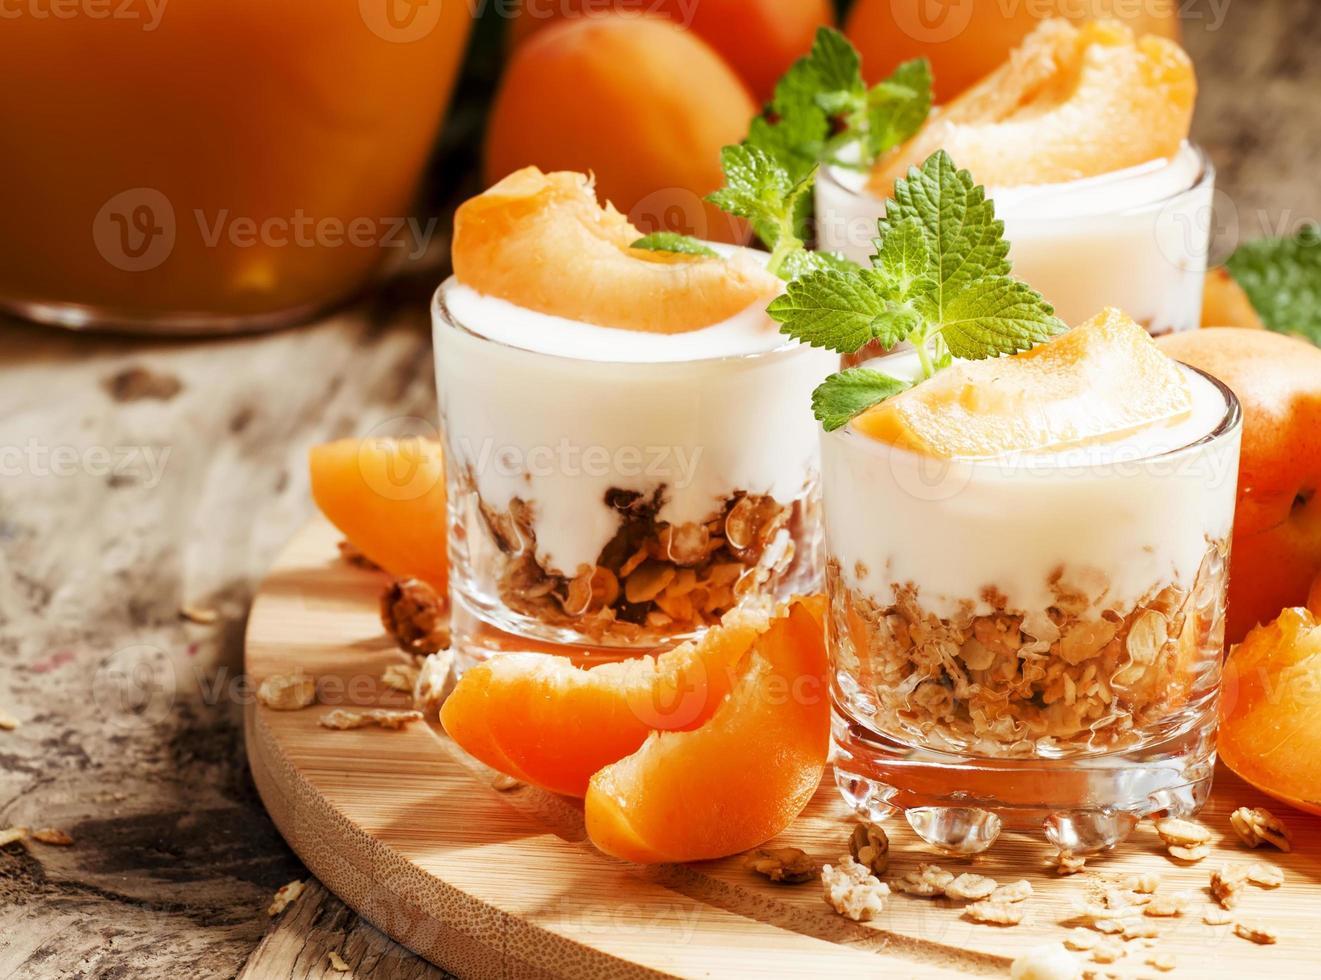 Homemade granola with yogurt and apricot photo